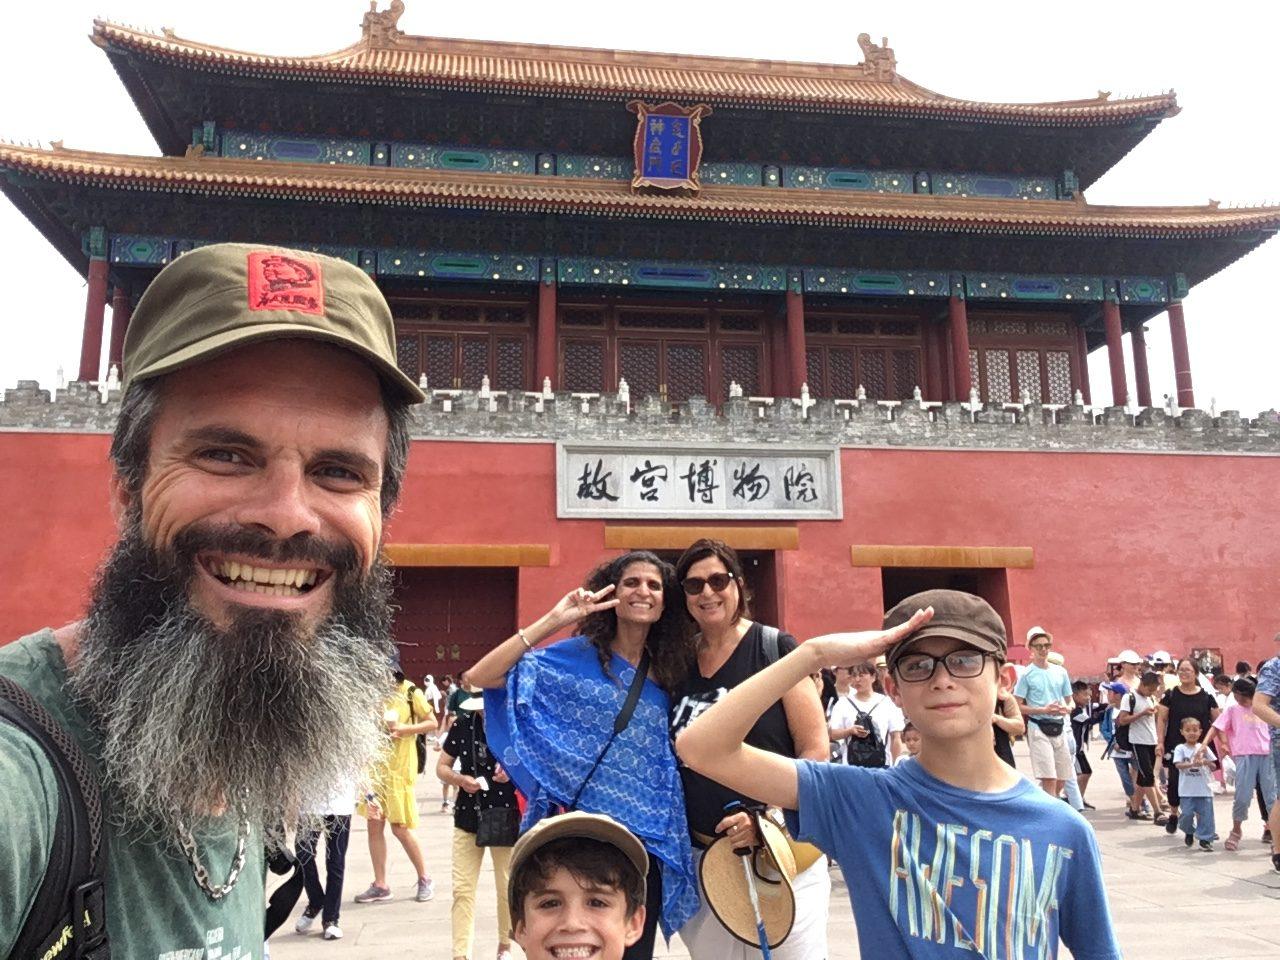 #30# CHINE, amazing Beijing et la grande muraille